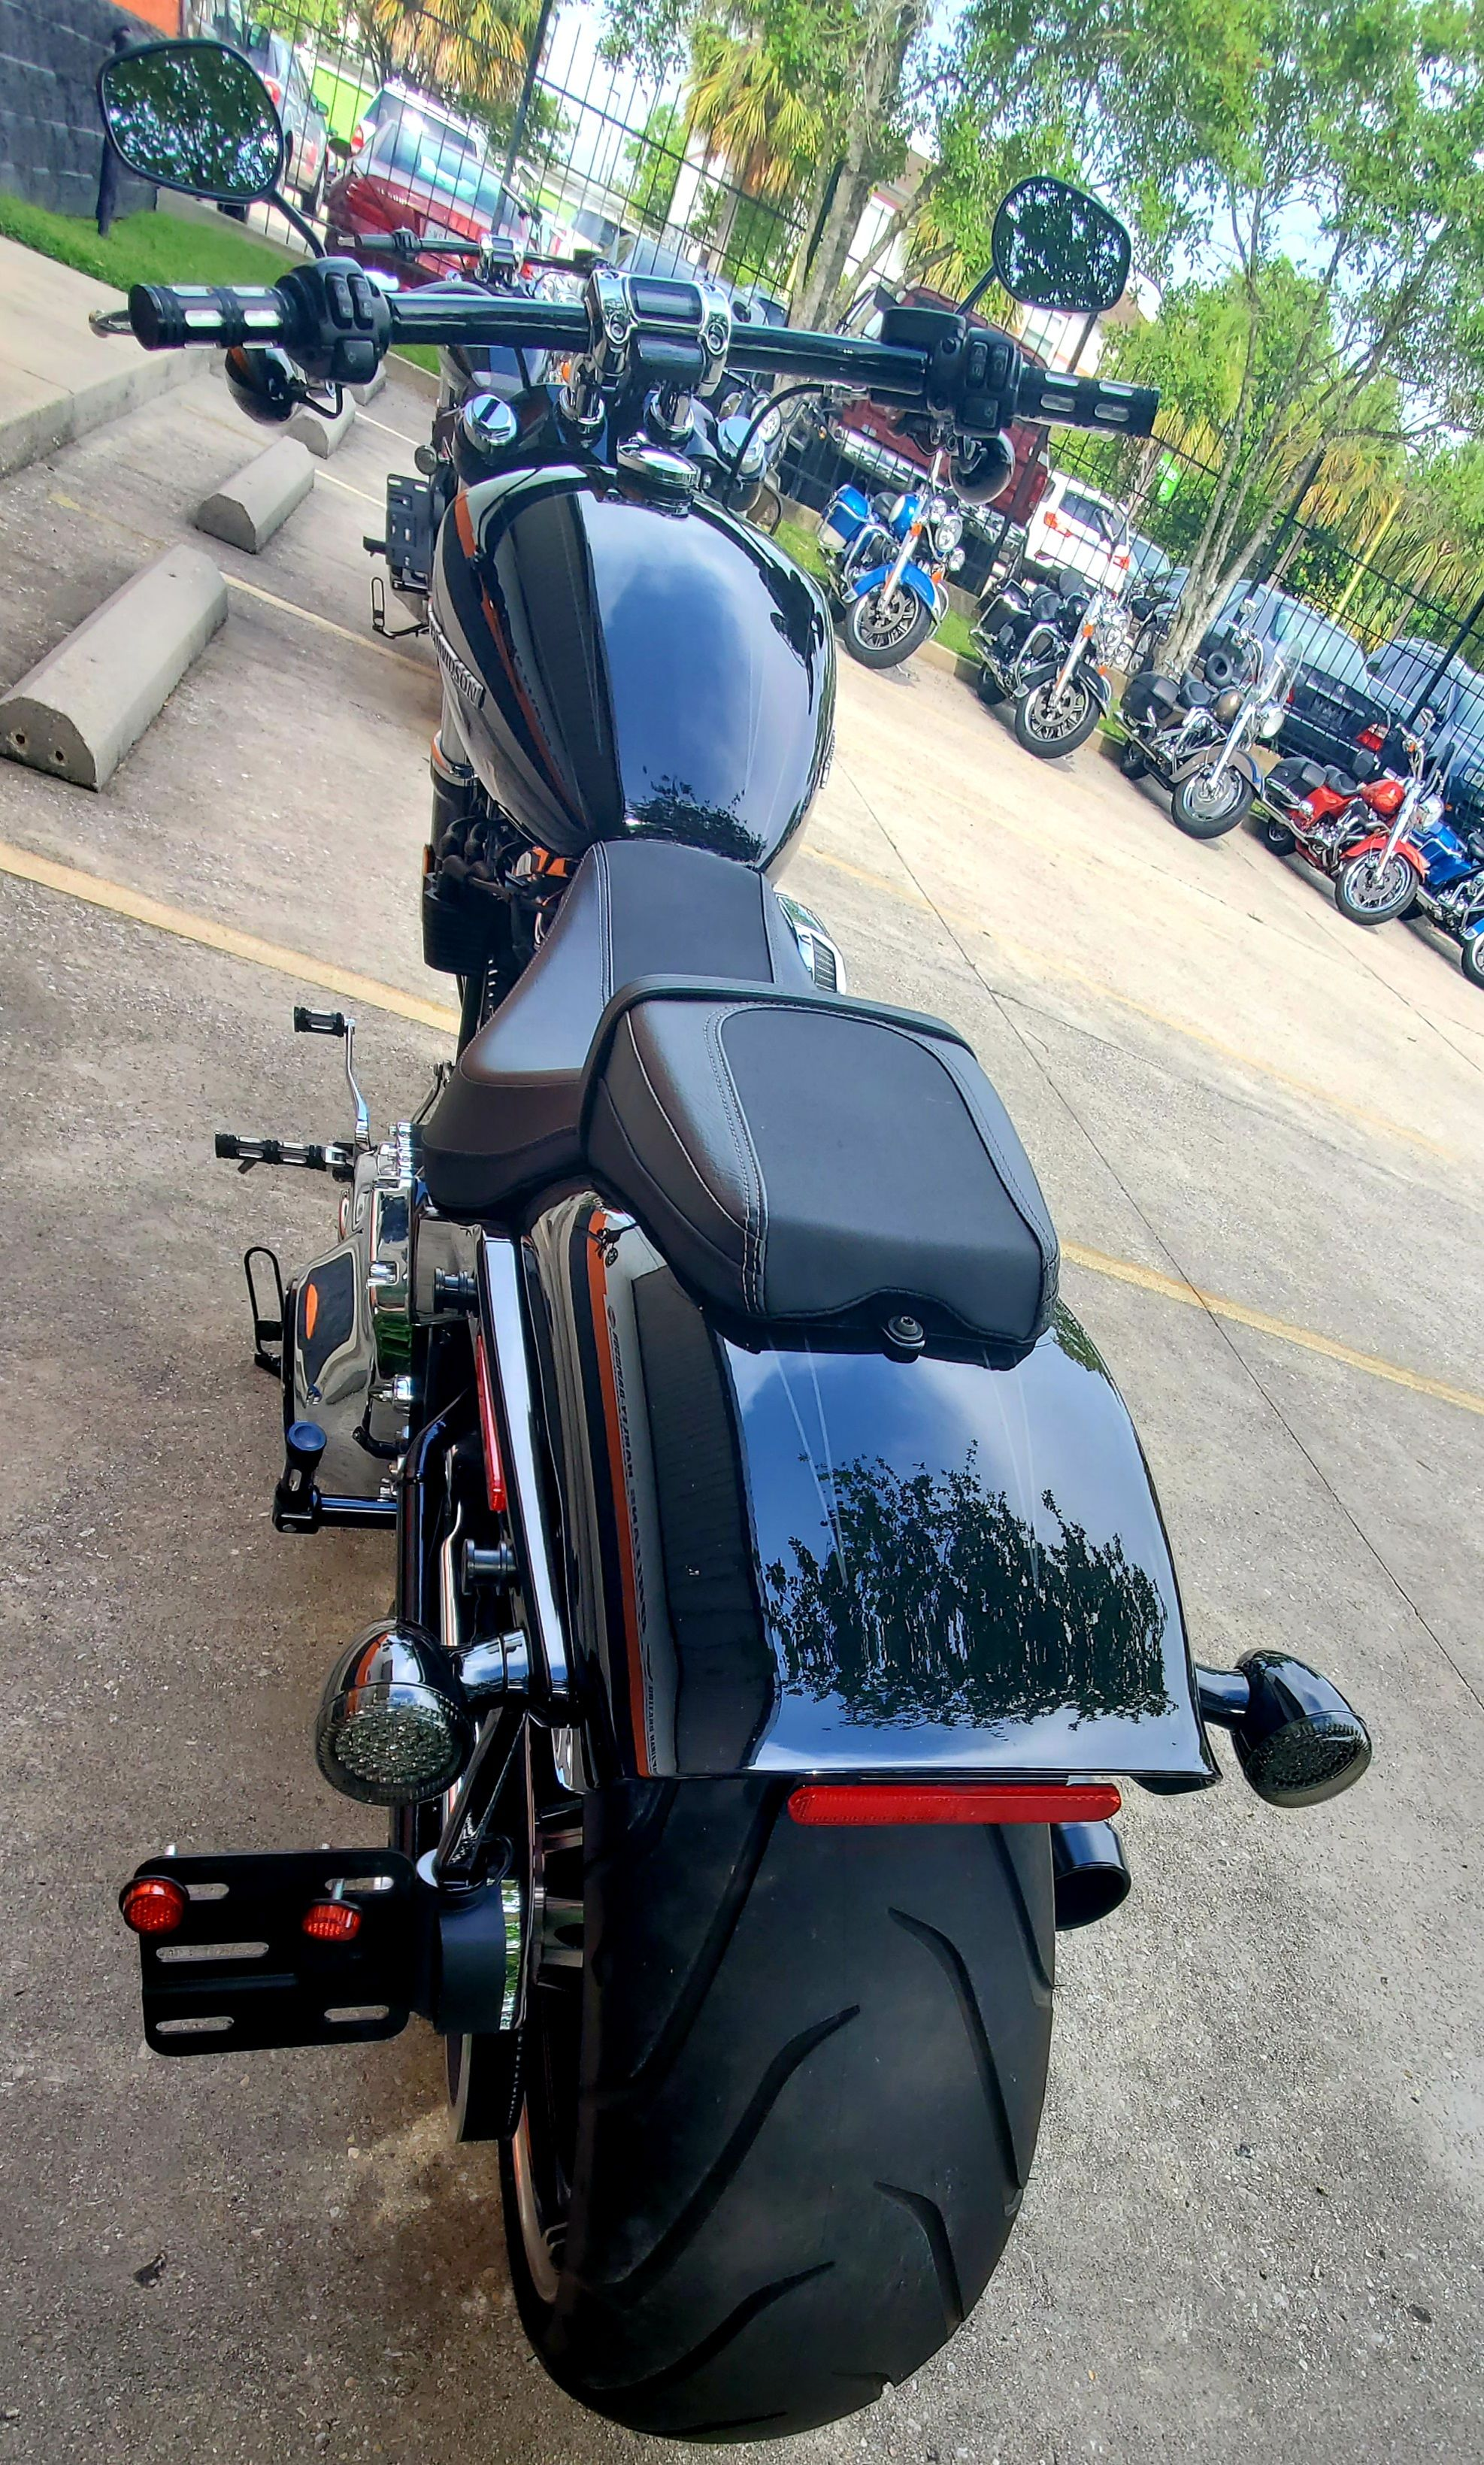 Pre-Owned 2020 Harley-Davidson Breakout 114 FXBRS